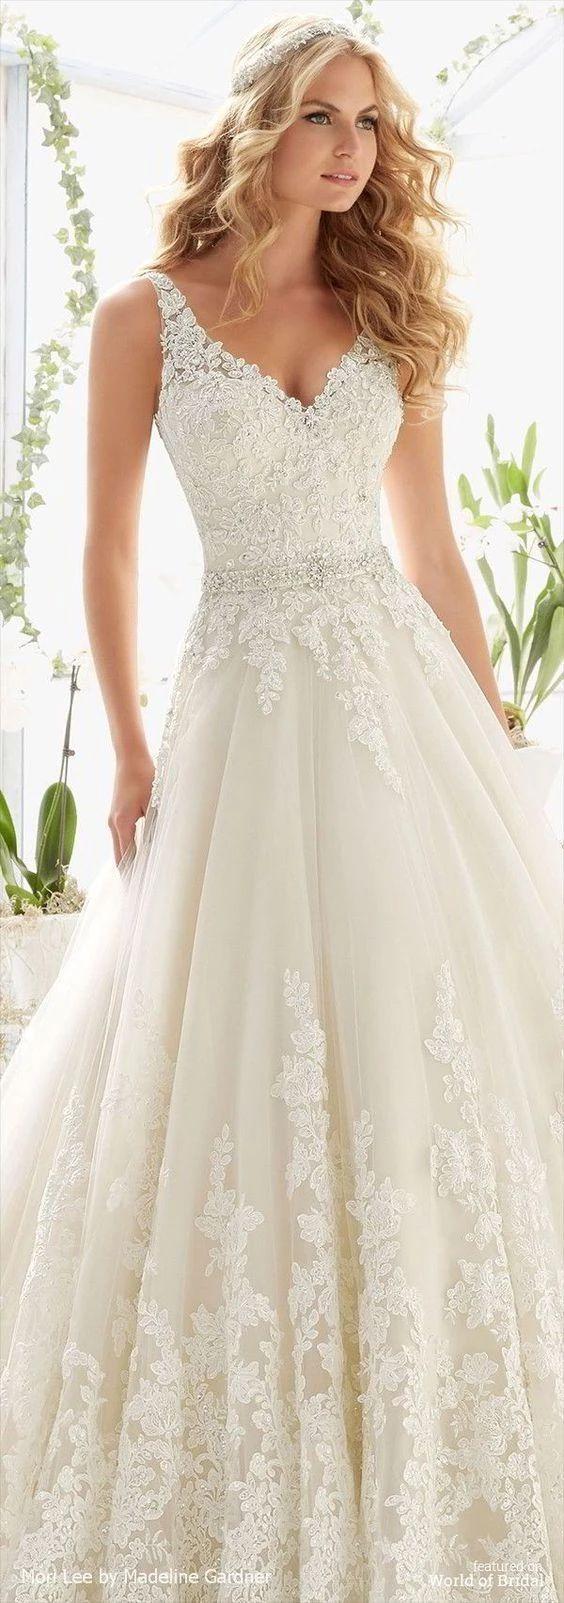 Photo of elegant v neck wedding dress,v back bride dress,wedding dress with applique